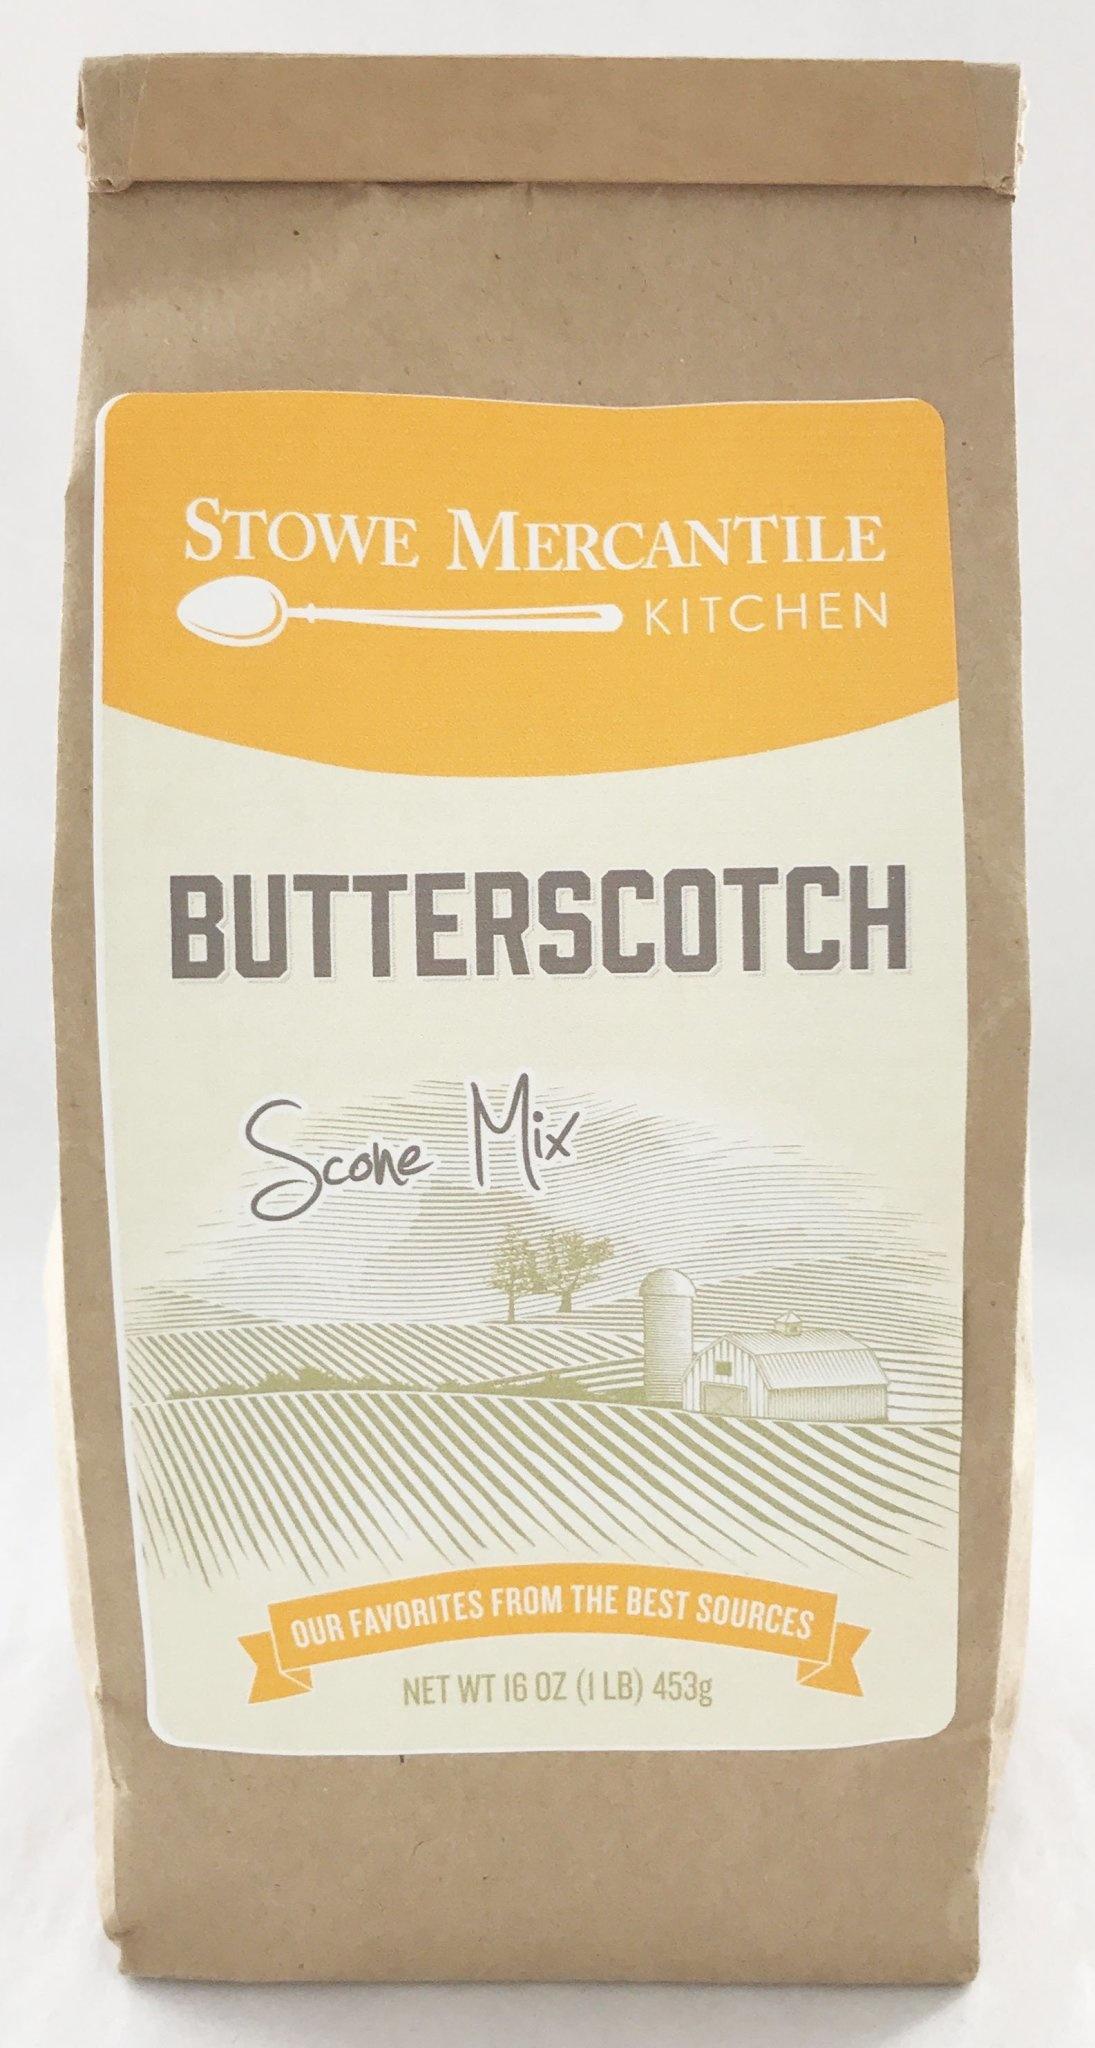 Stowe Mercantile Kitchen Scone Mix Butterscotch